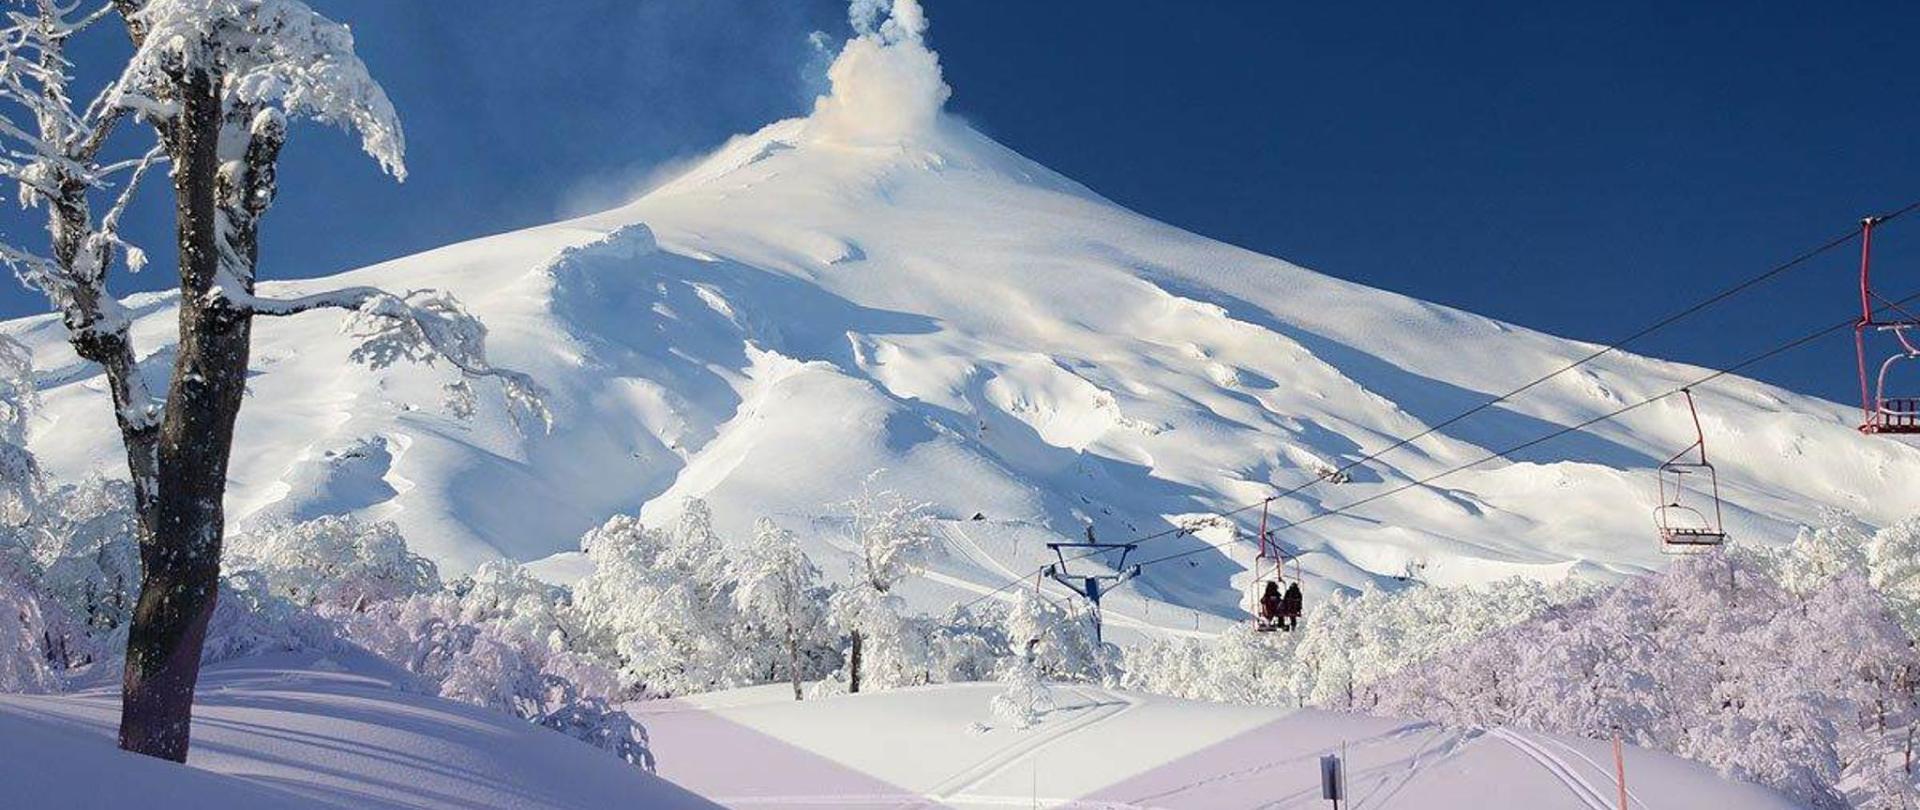 centro-ski-para-pagina-web-1.jpg